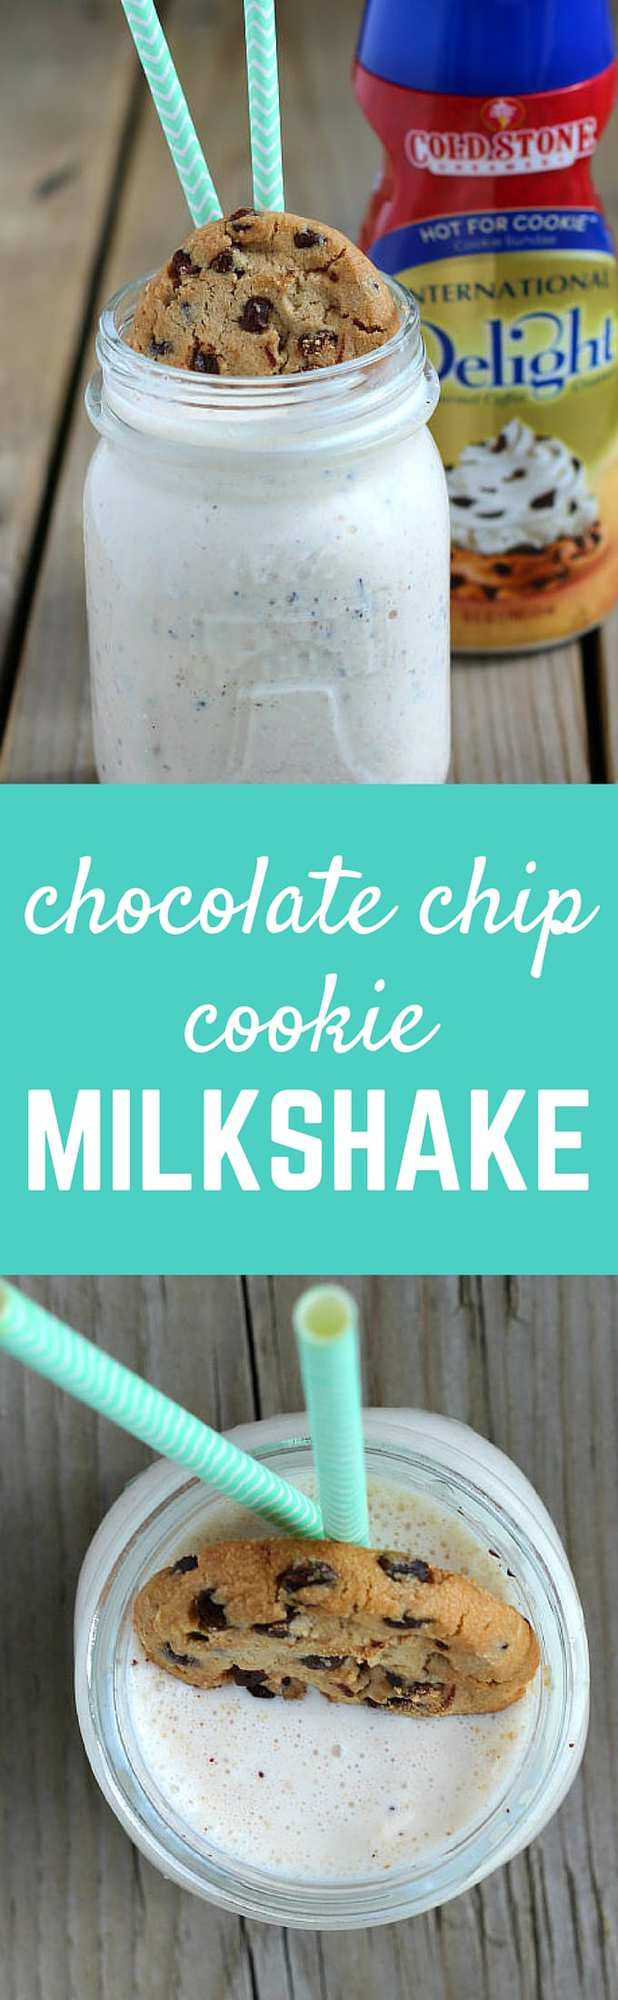 Chocolate Chip Cookie Milkshake - get the easy and fun recipe on RachelCooks.com